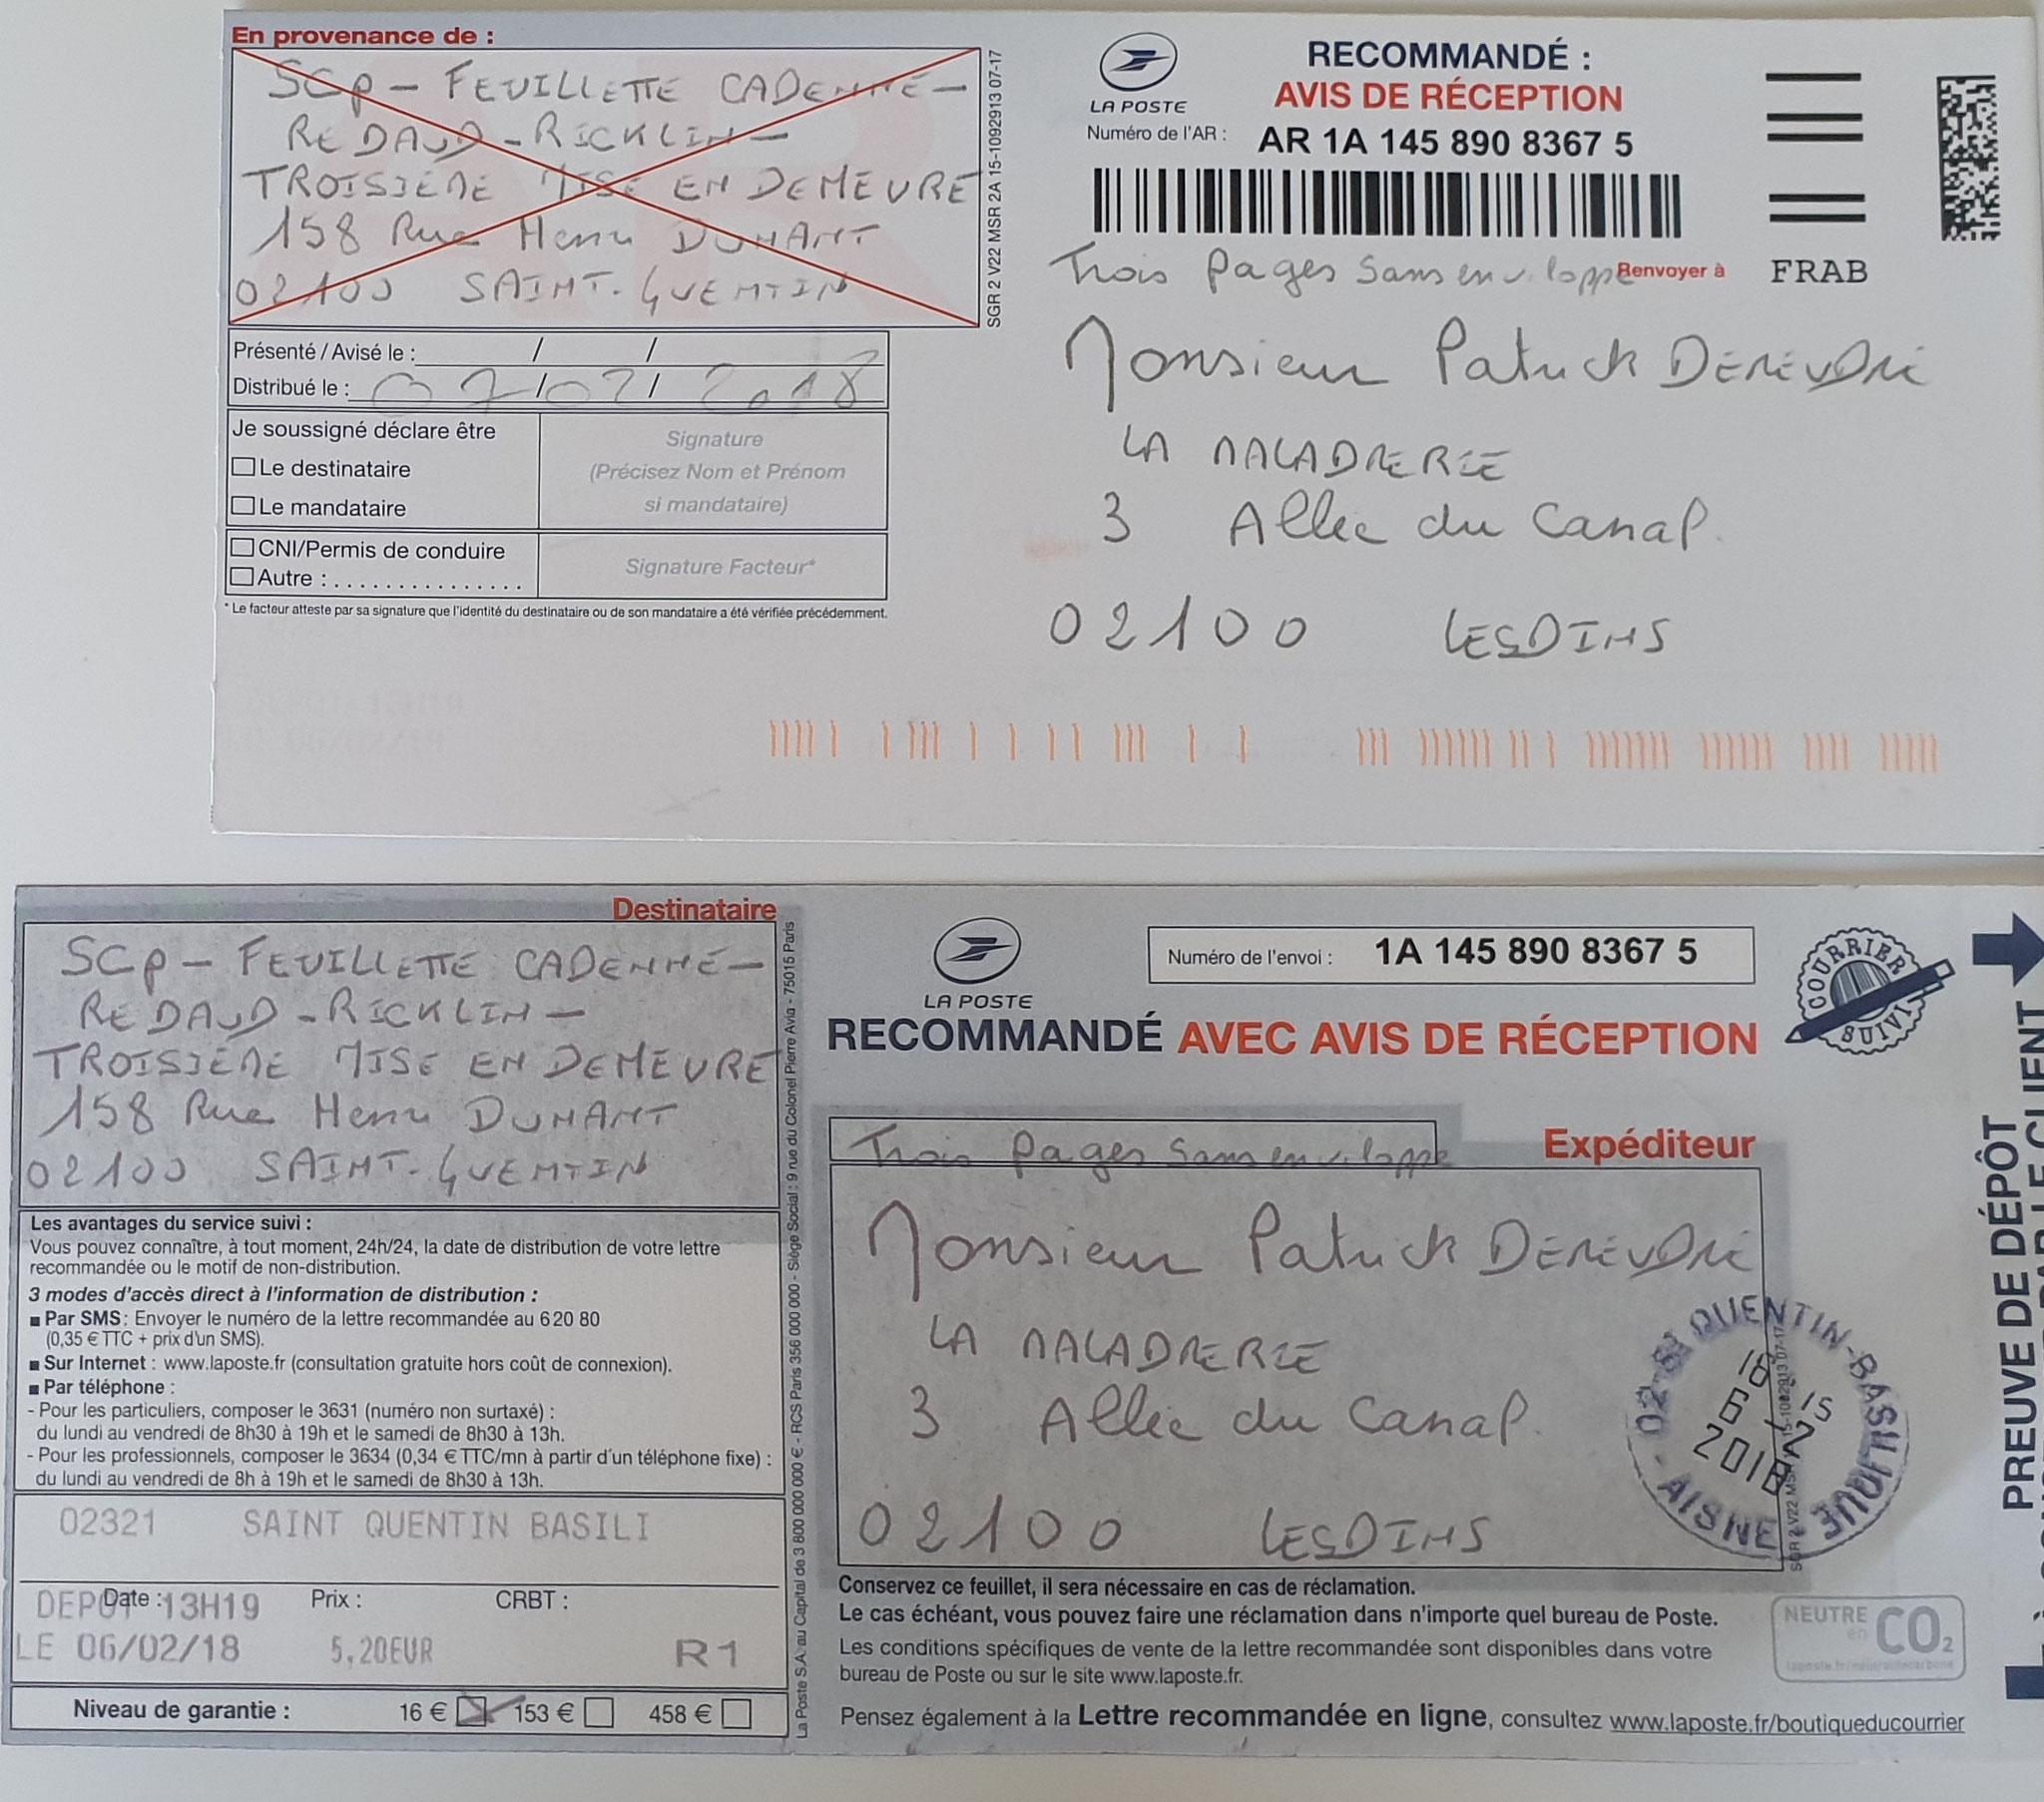 Le 06 Février 2018 Troisième LRAR N0 1A 145 890 8367 5 (trois pages) www.jenesuispasunchien.fr www.jesuisvictime.fr www.jesuispatrick.fr